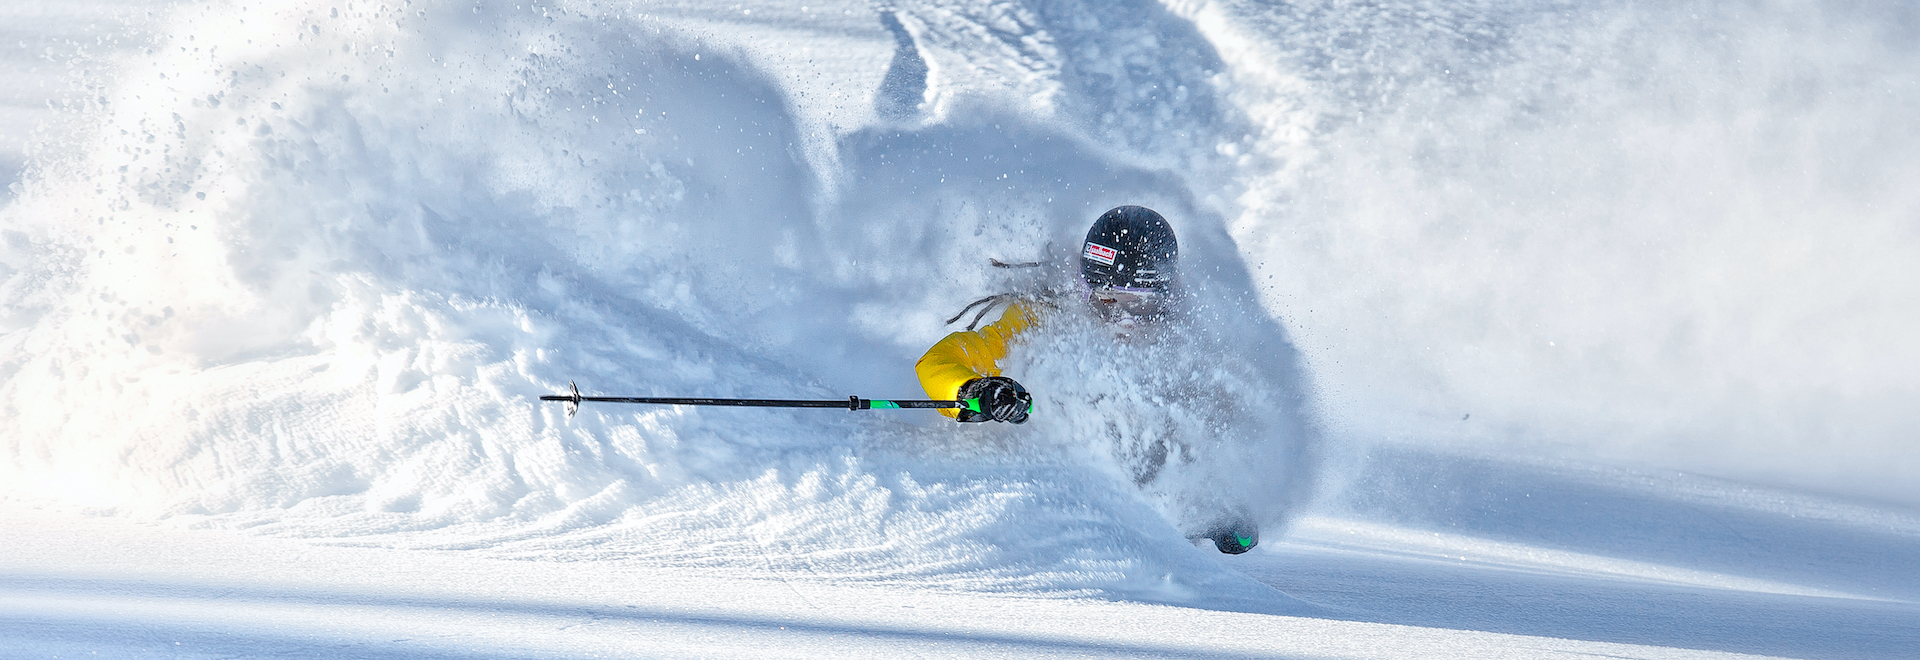 Ski in Saalbach Hinterglem